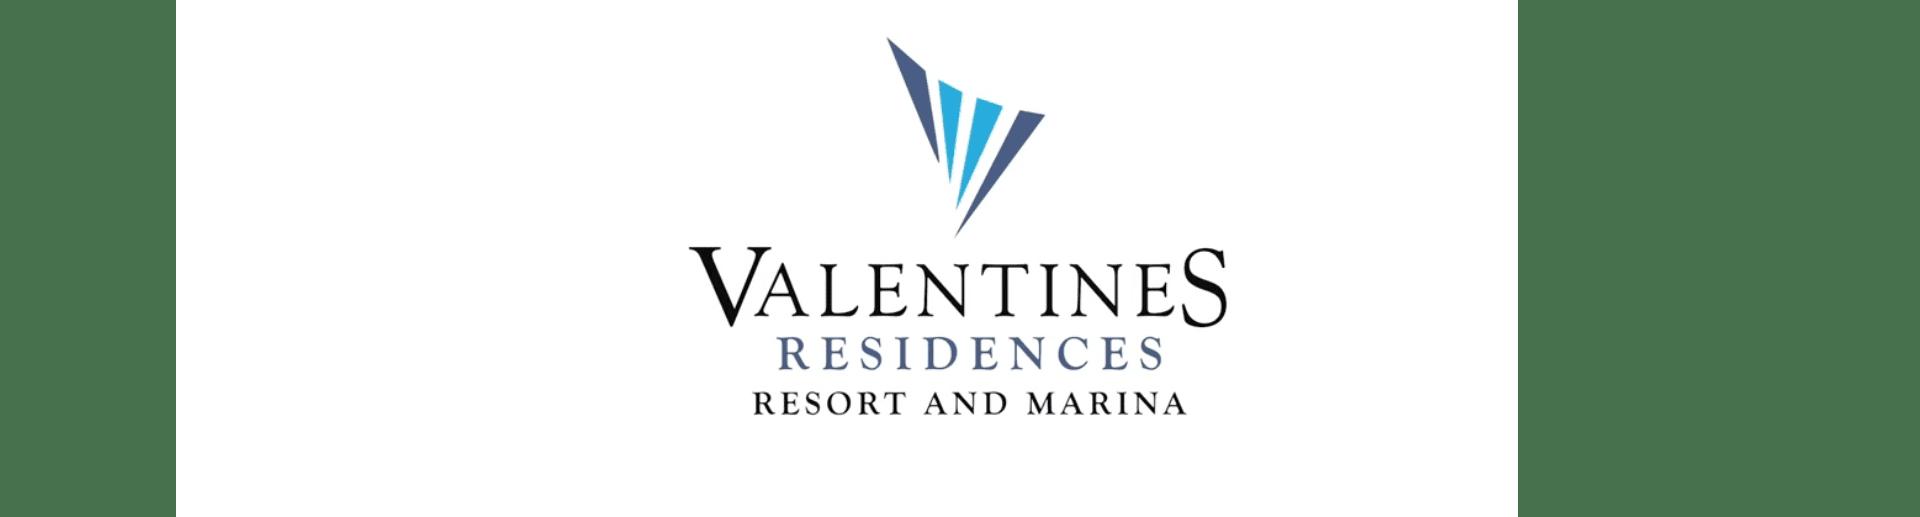 Valentines Residences